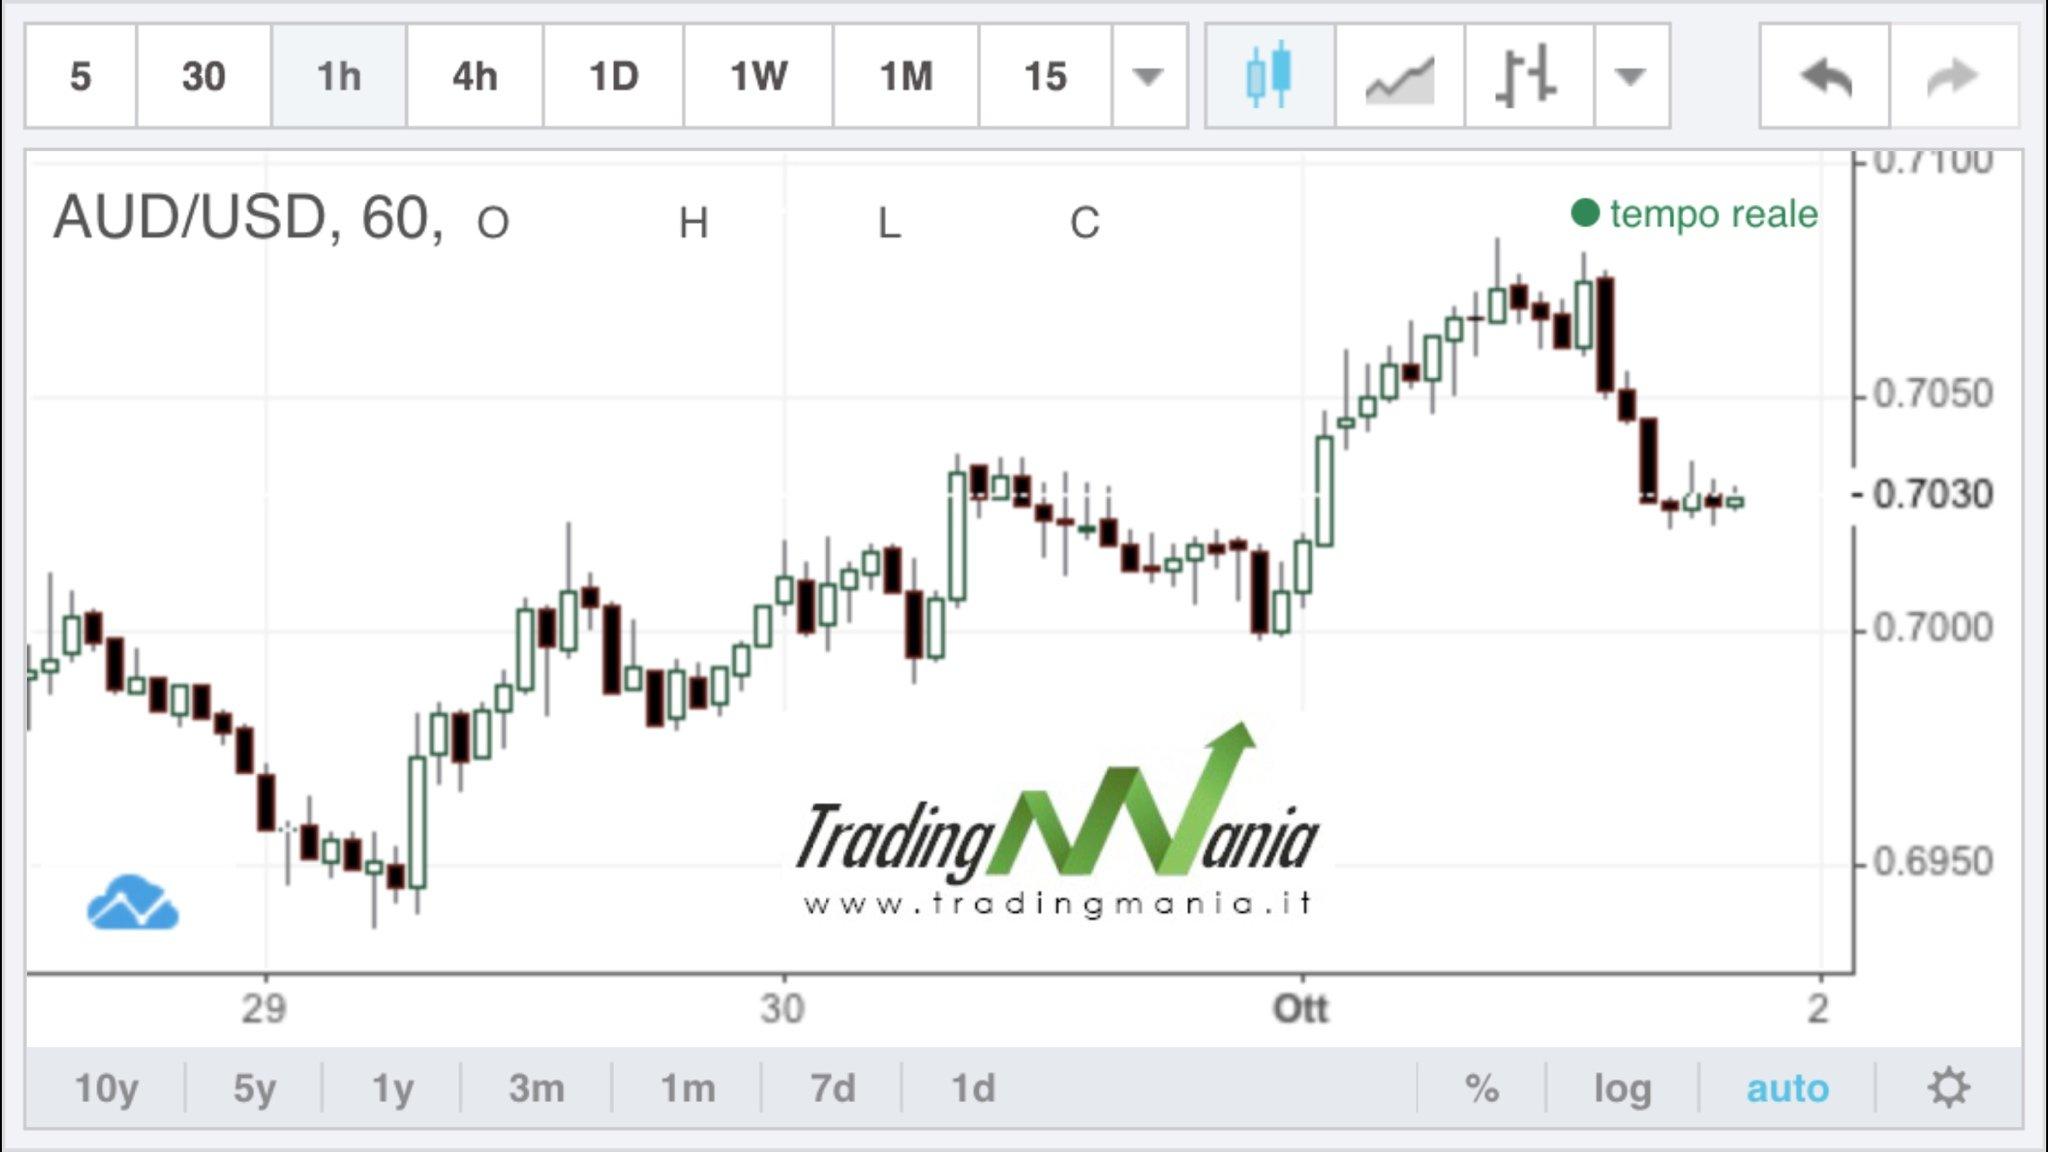 Strategia di trading online su Forex AUDUSD